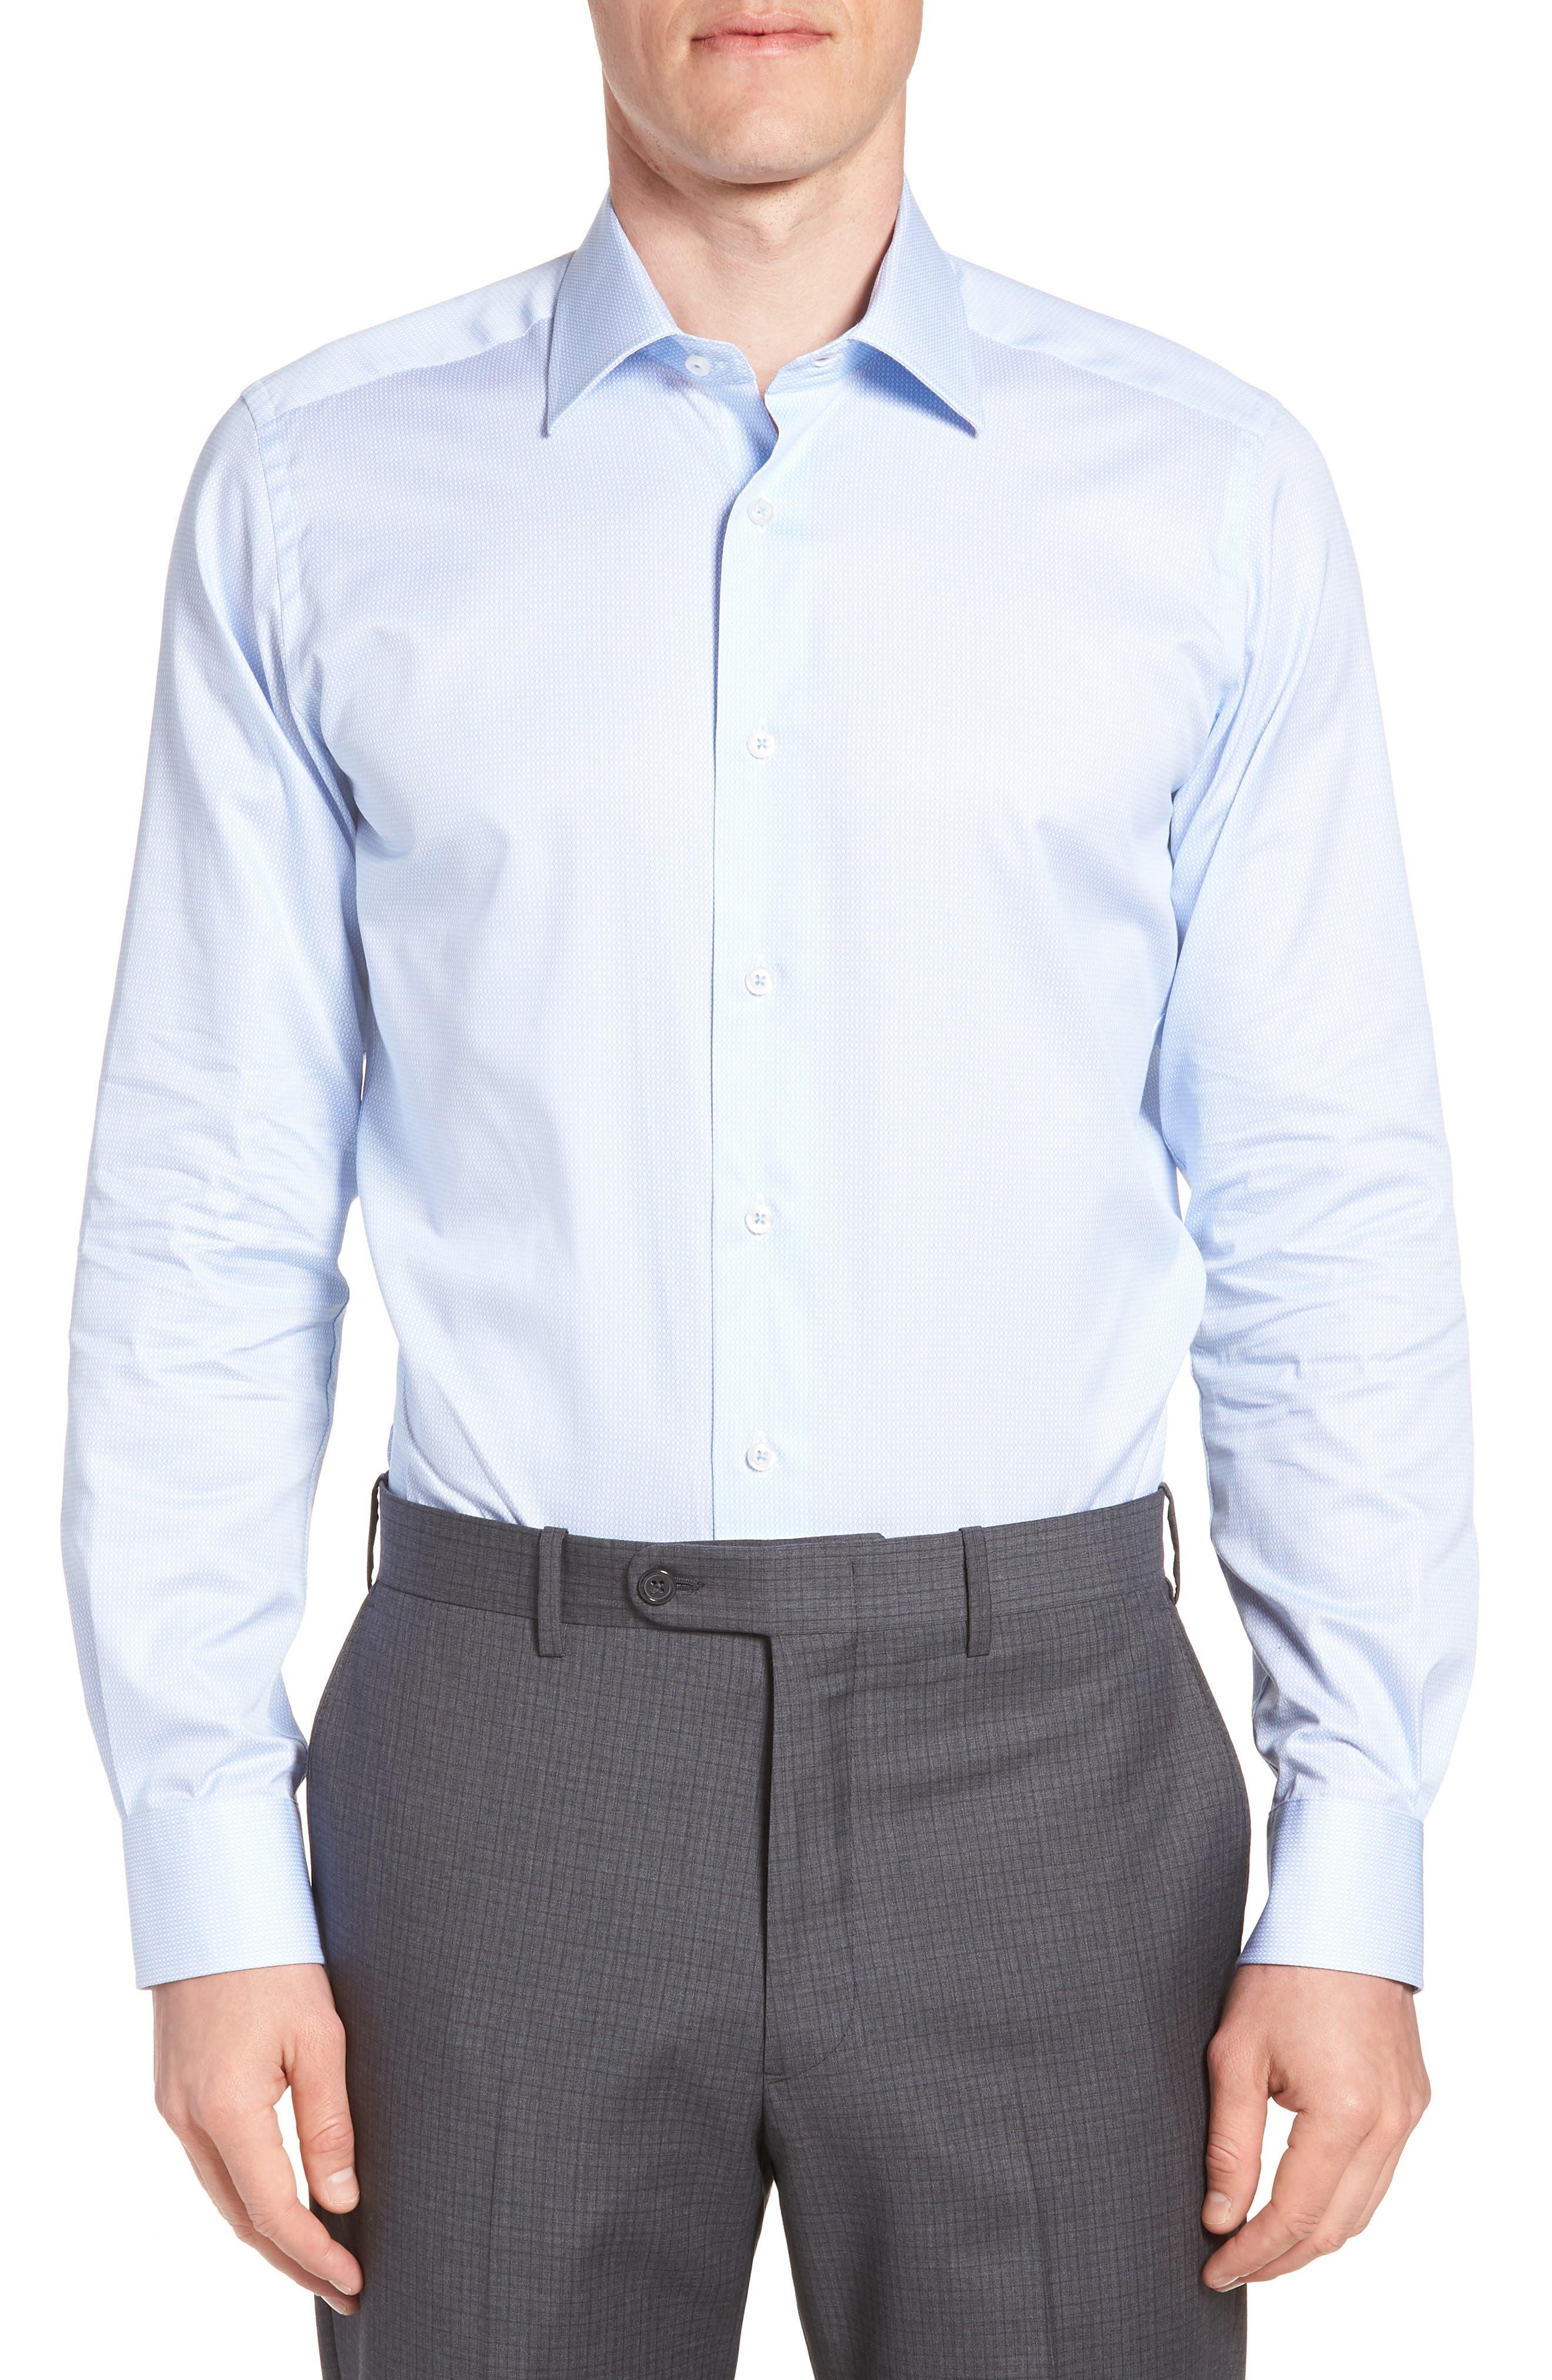 Nickoe Trim Fit Dress Shirt,                         Main,                         color, BLUE